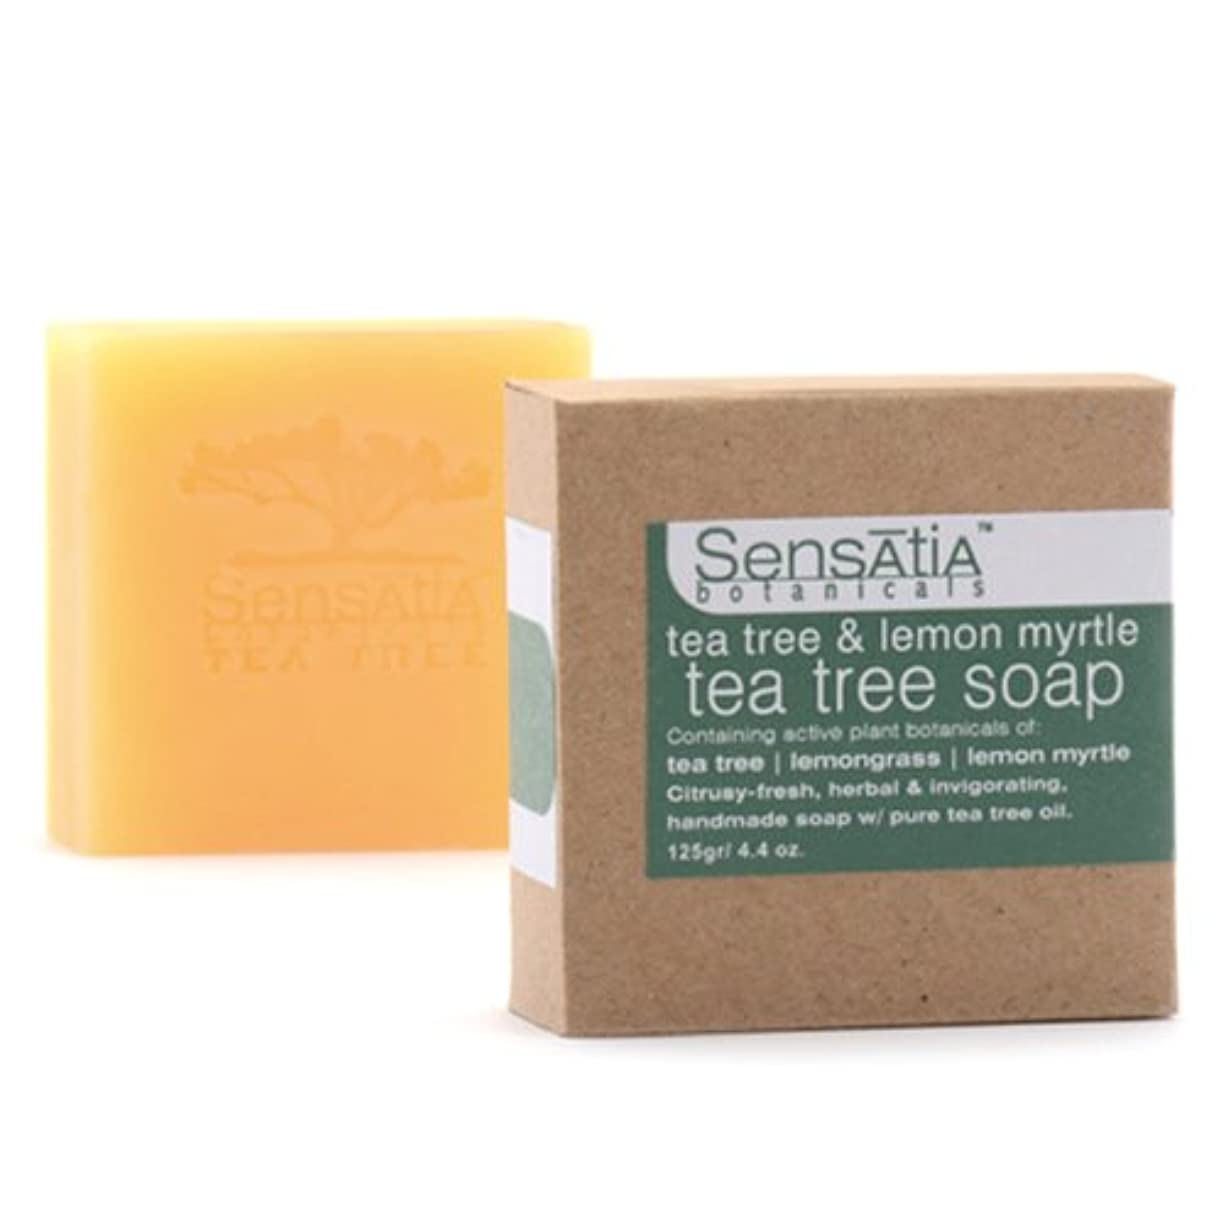 Sensatia(センセイシャ) ティーツリーソープ レモンマートル 125g